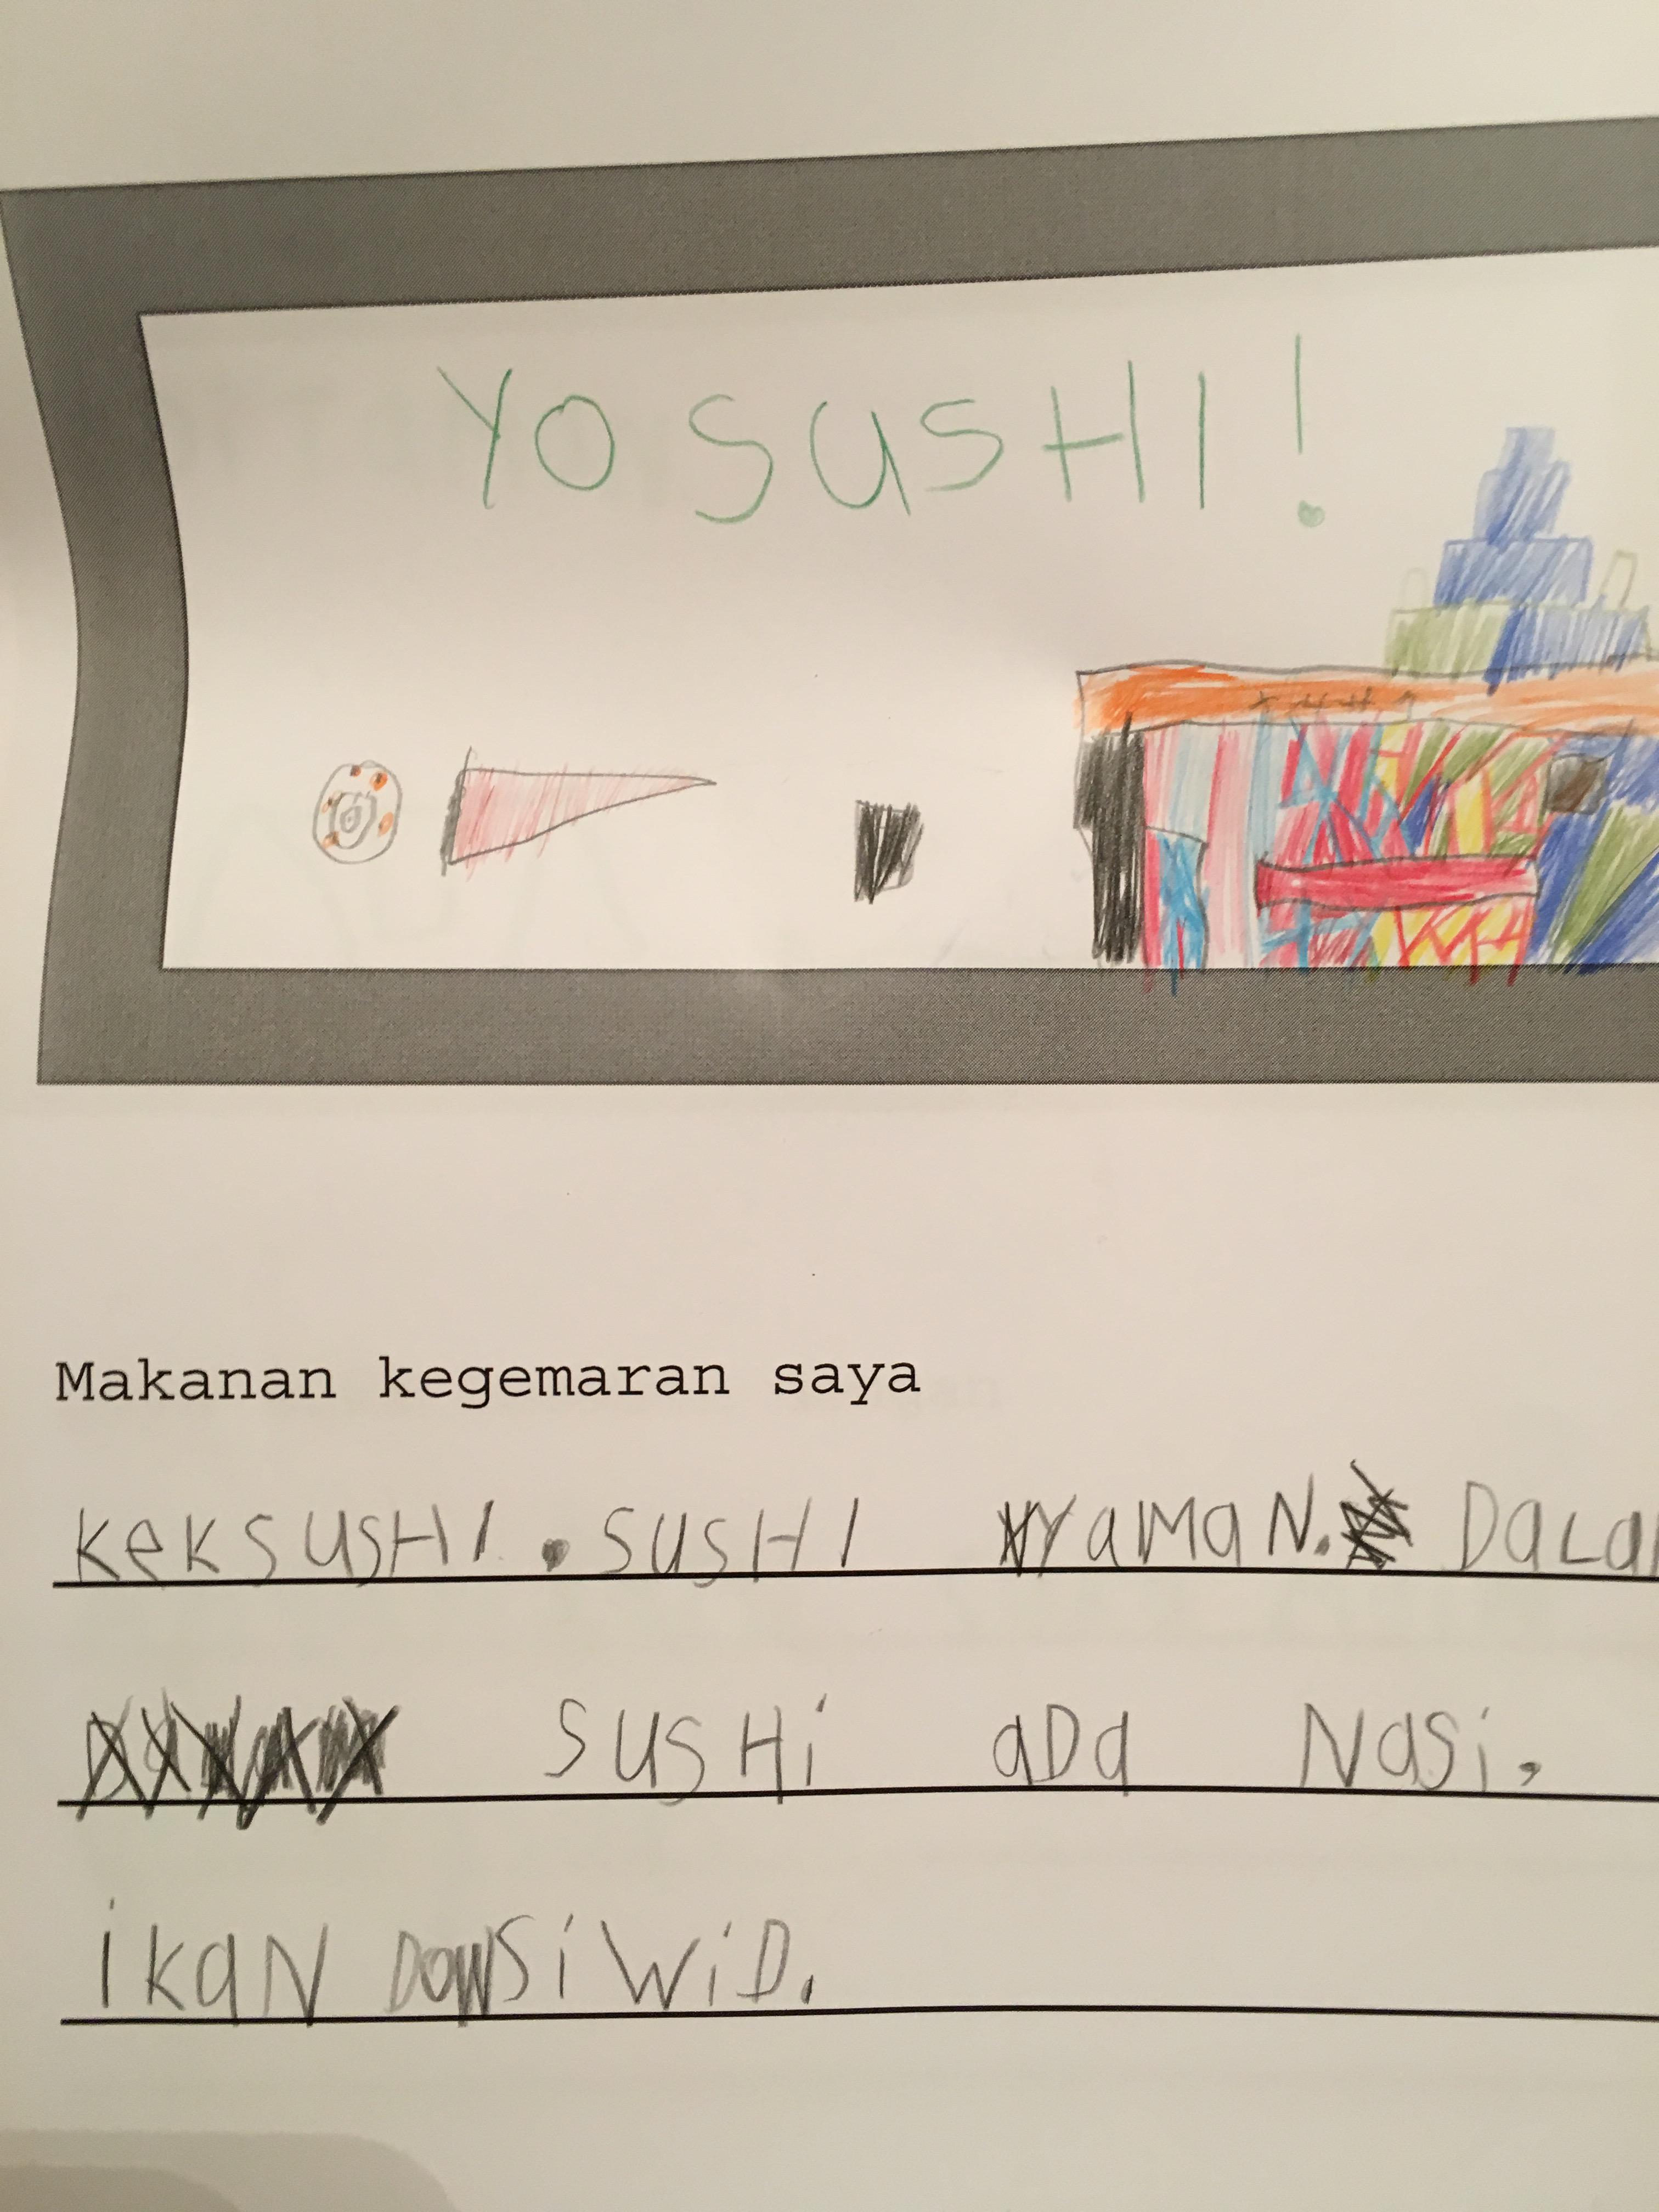 Update on Projek Bahasa Melayu   bibiranbanar